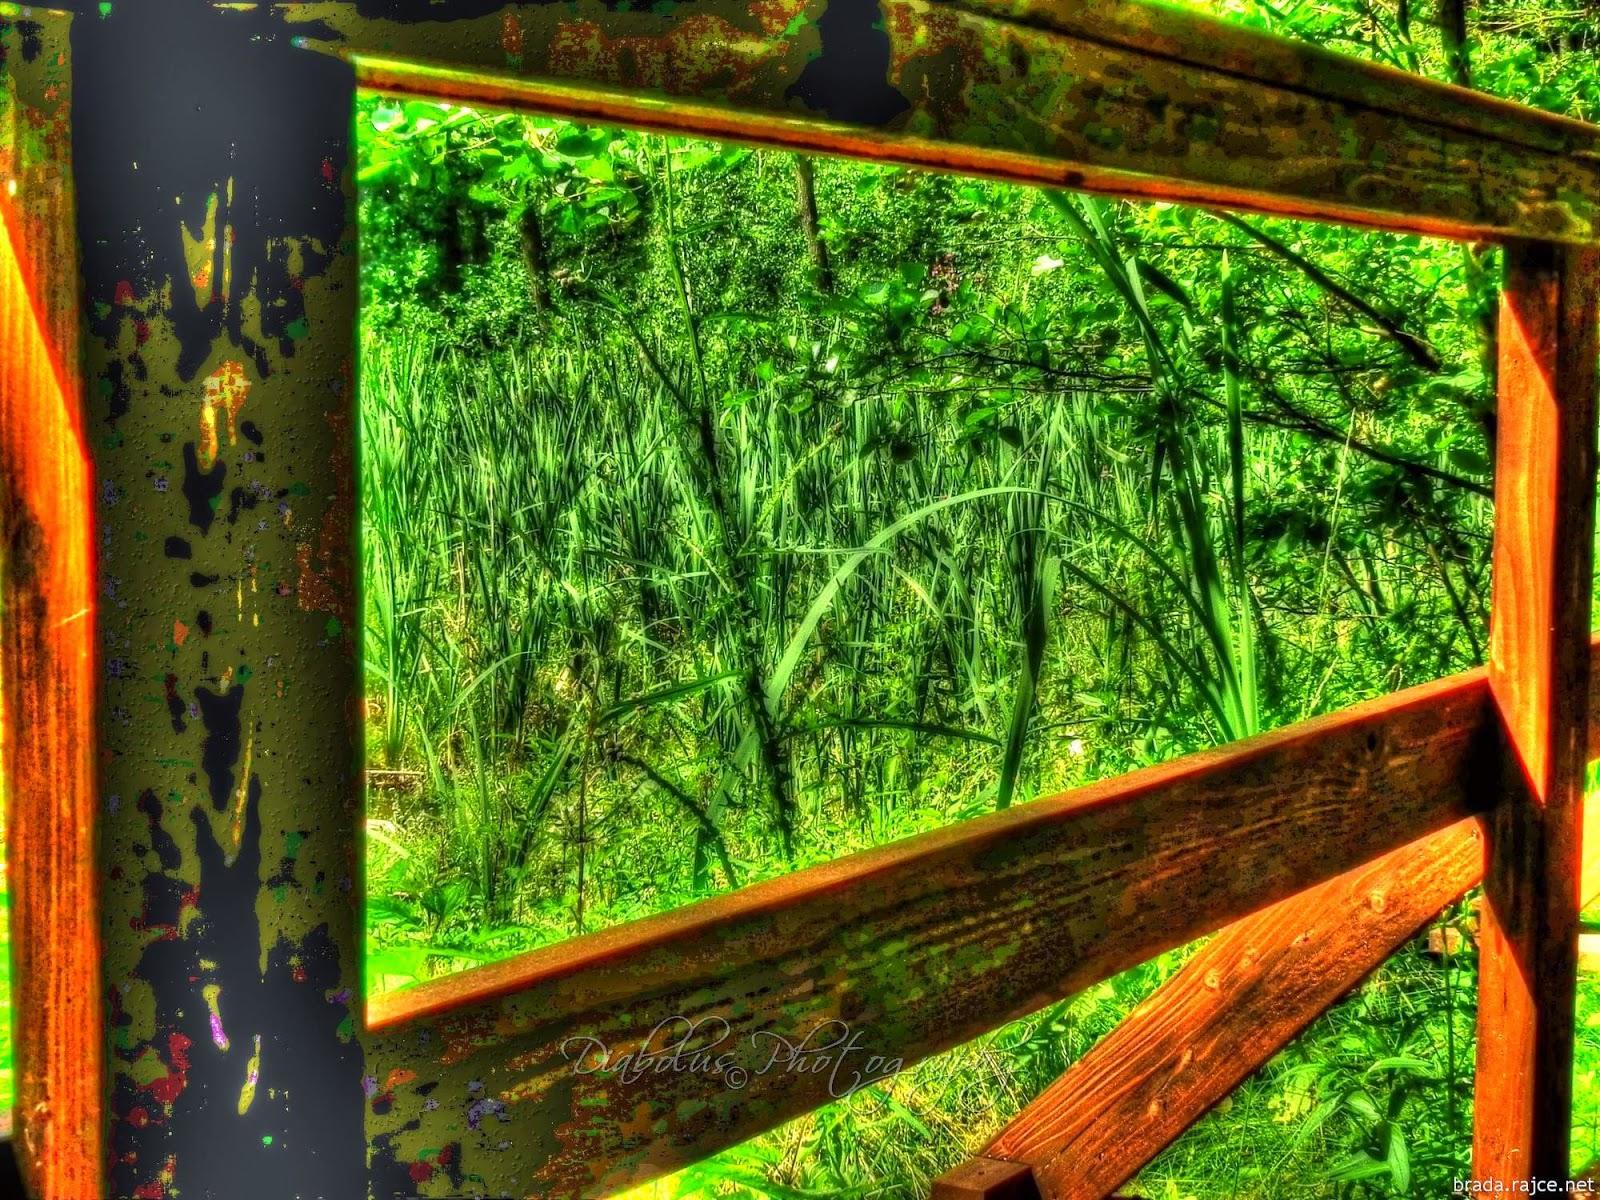 Vyschlý rybník - Cvikov